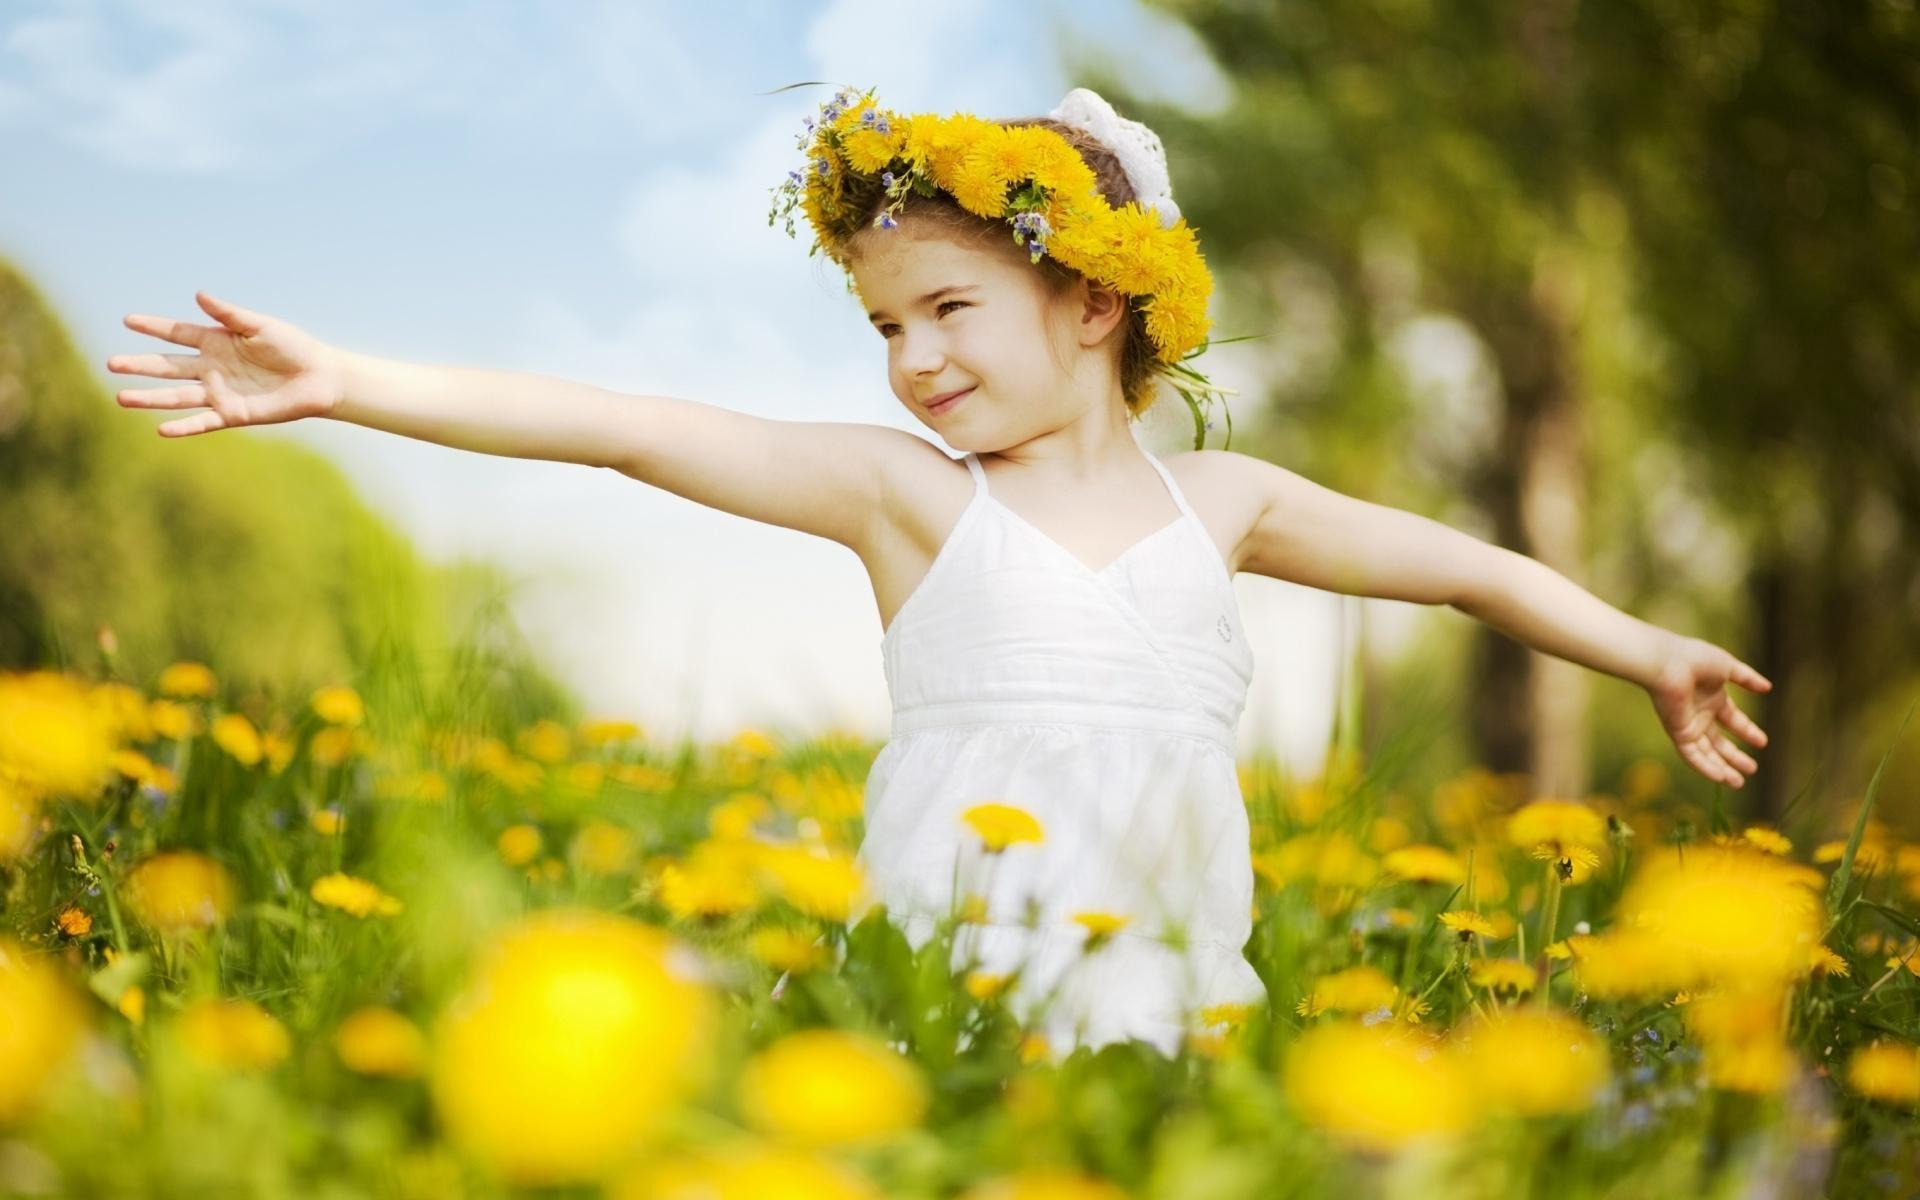 wallpaper.wiki-Lovely-Baby-Girl-Wallpaper-Free-Download-